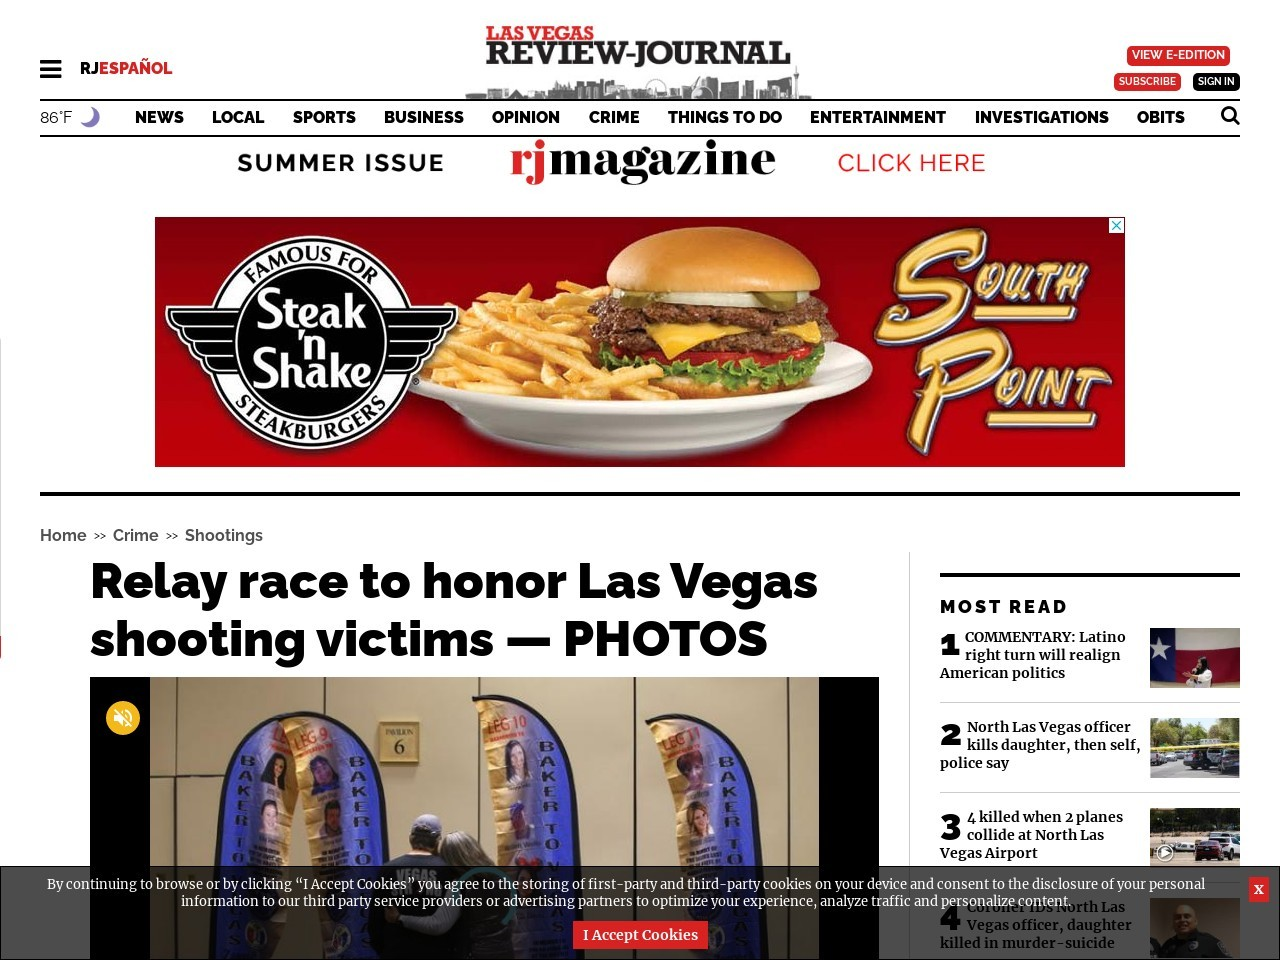 Relay race to honor Las Vegas shooting victims — PHOTOS